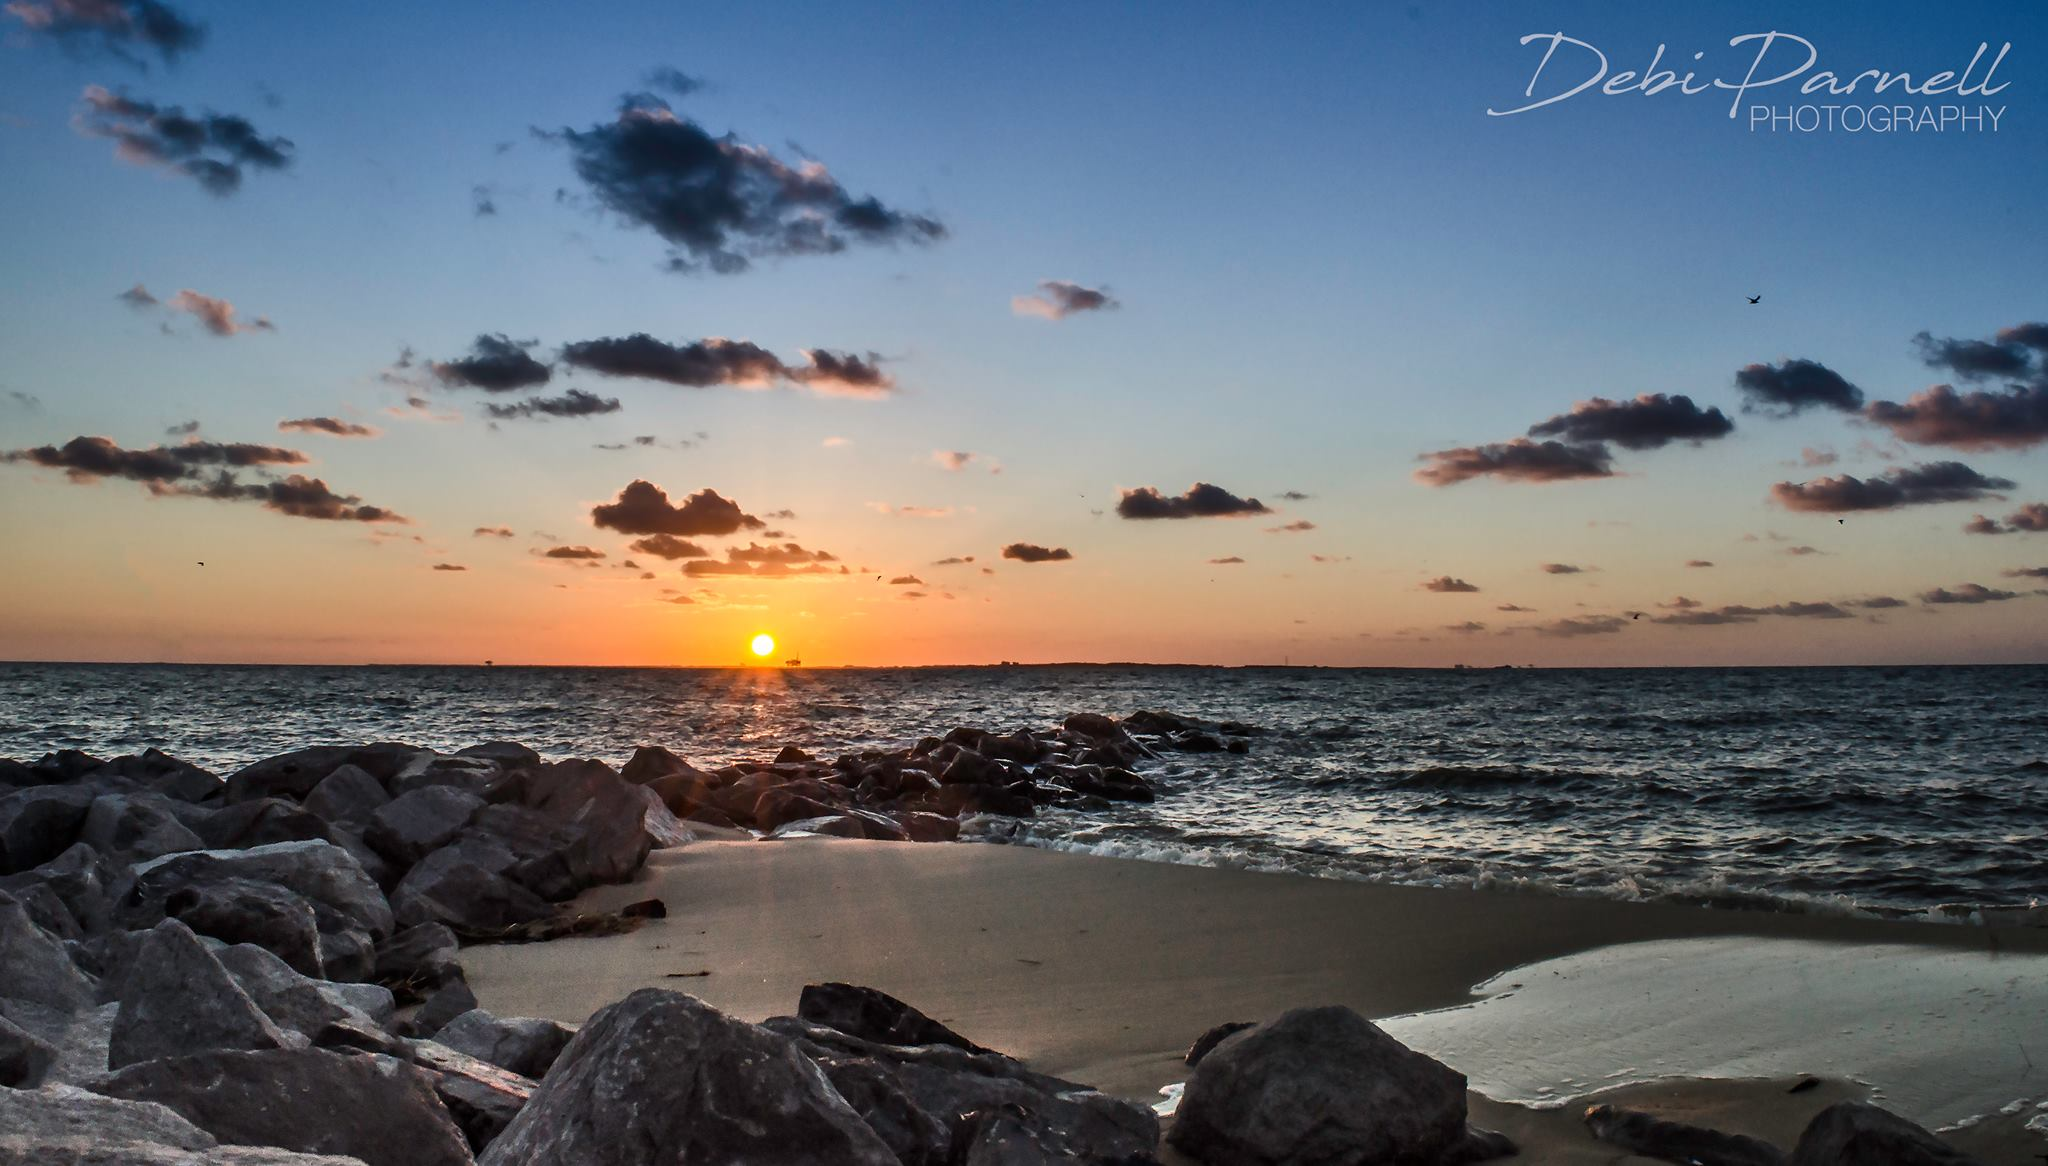 Dauphin Island Delight